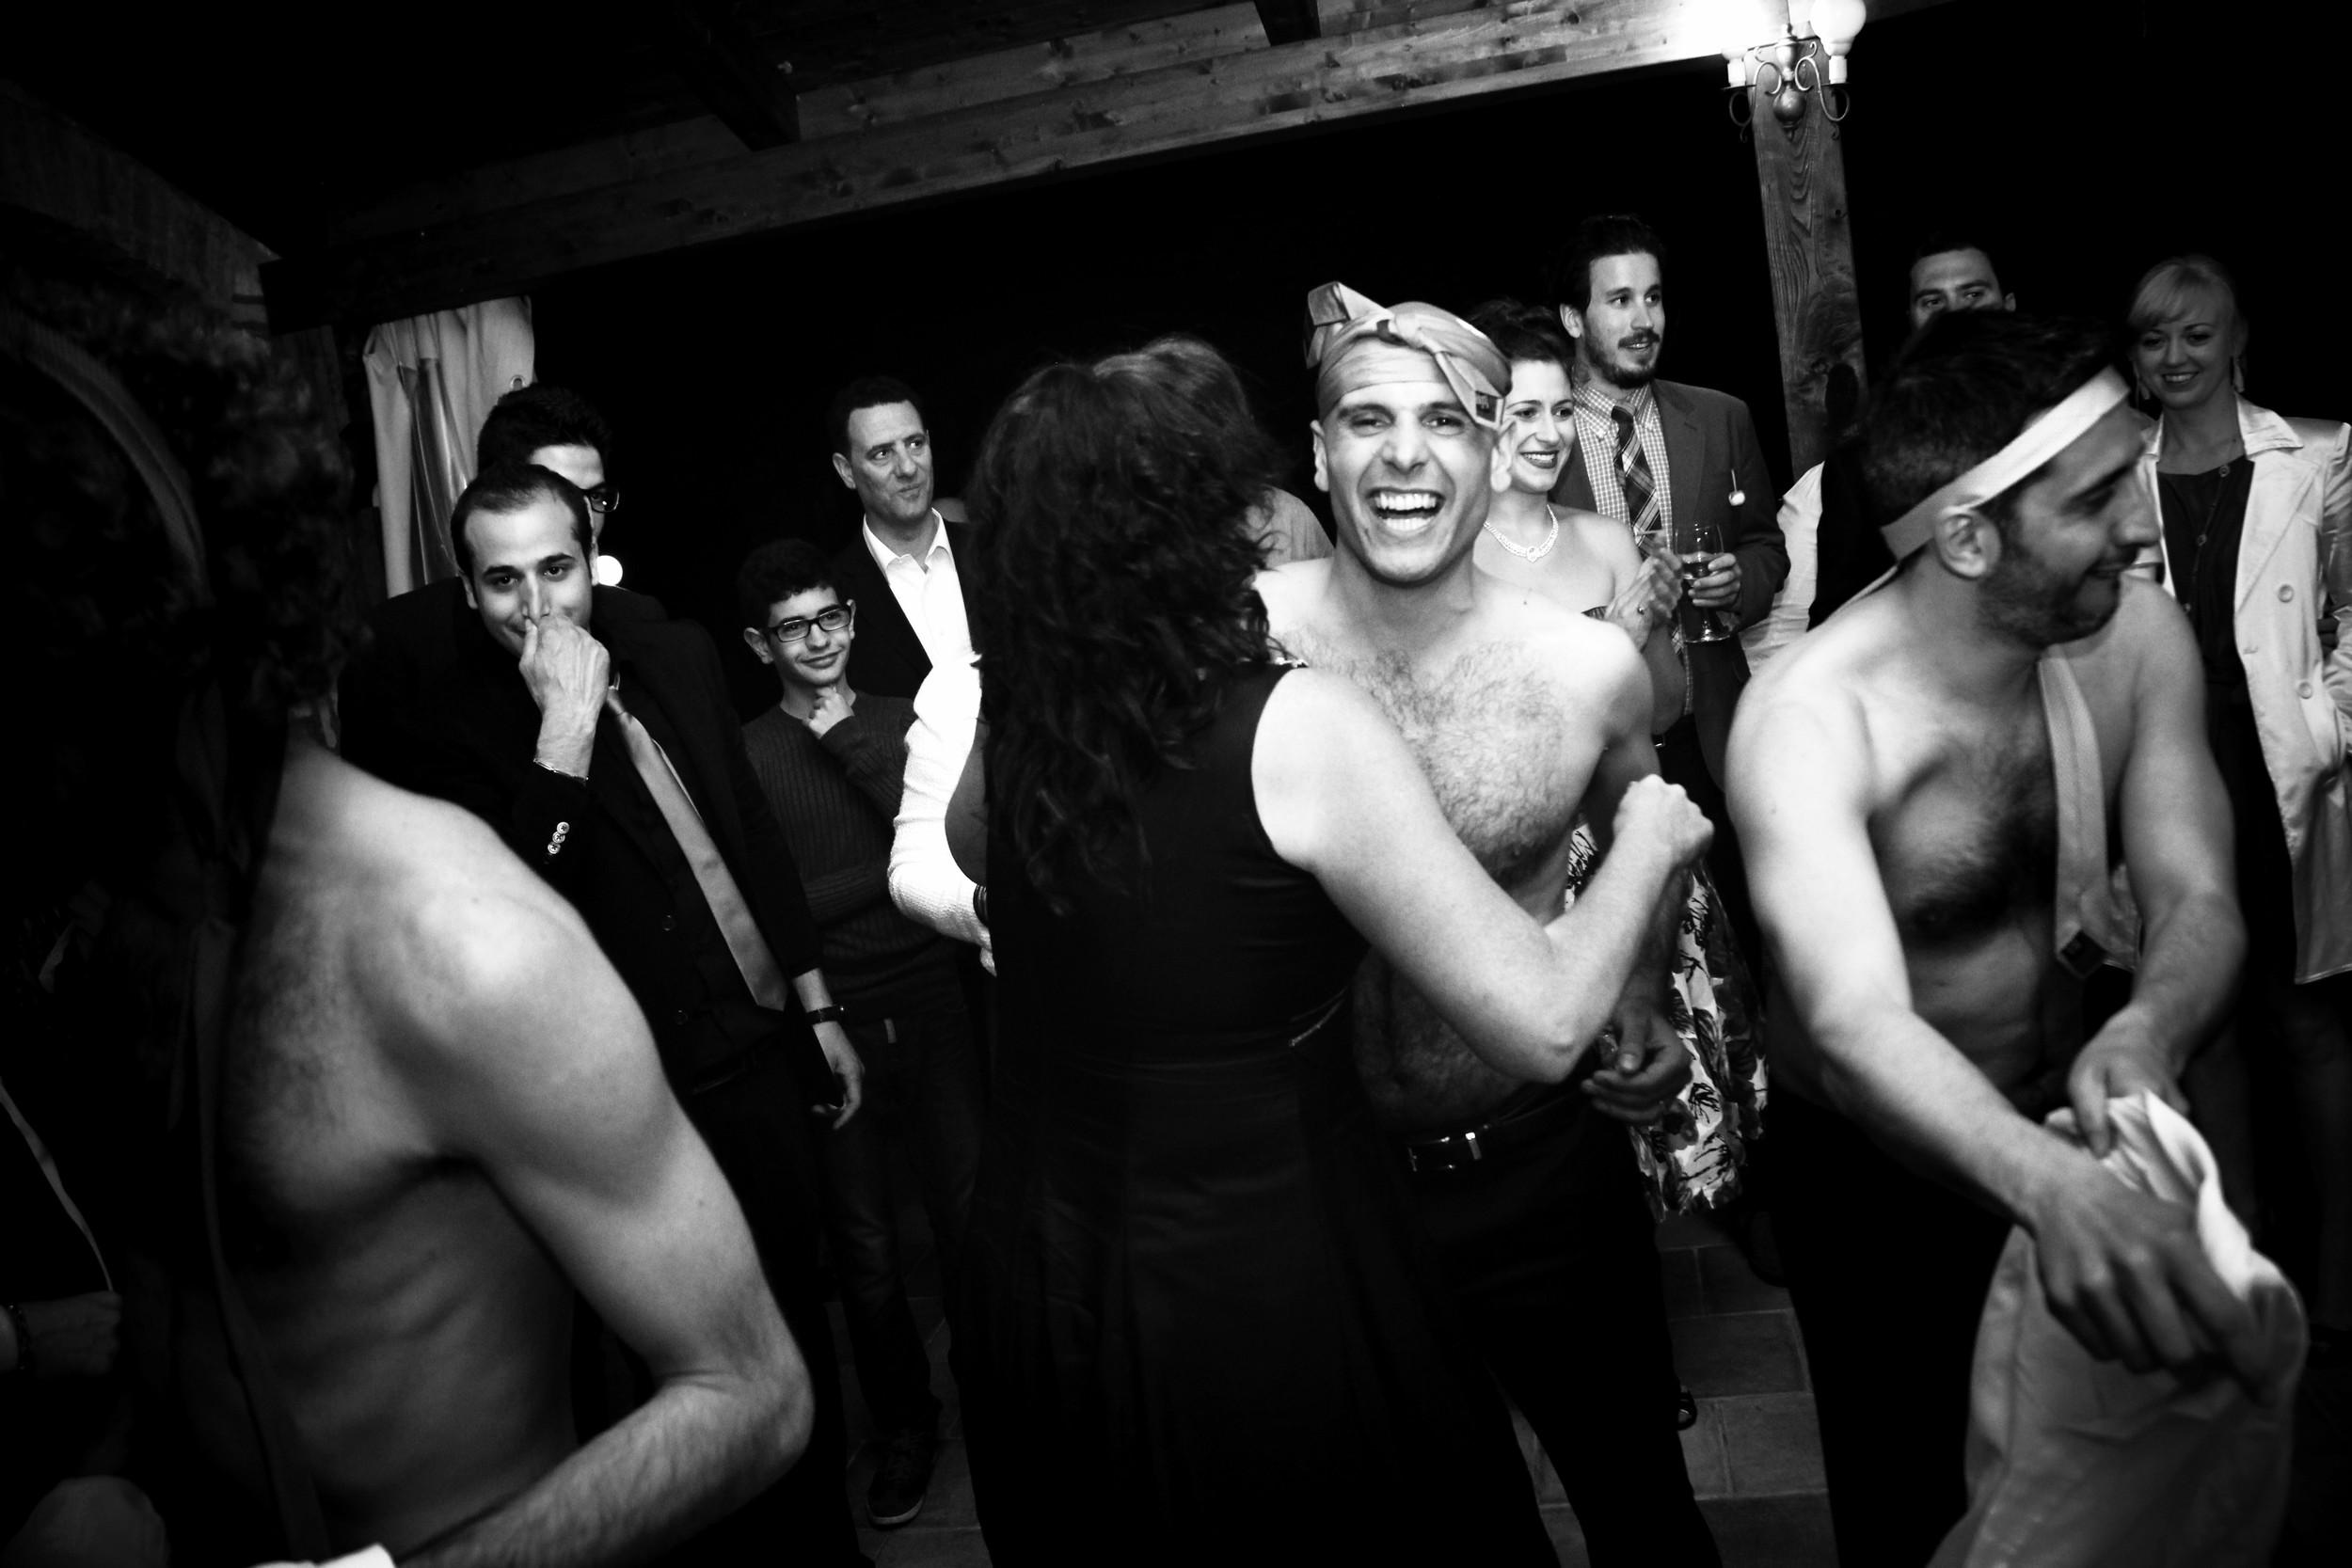 wedding6_effected.jpg